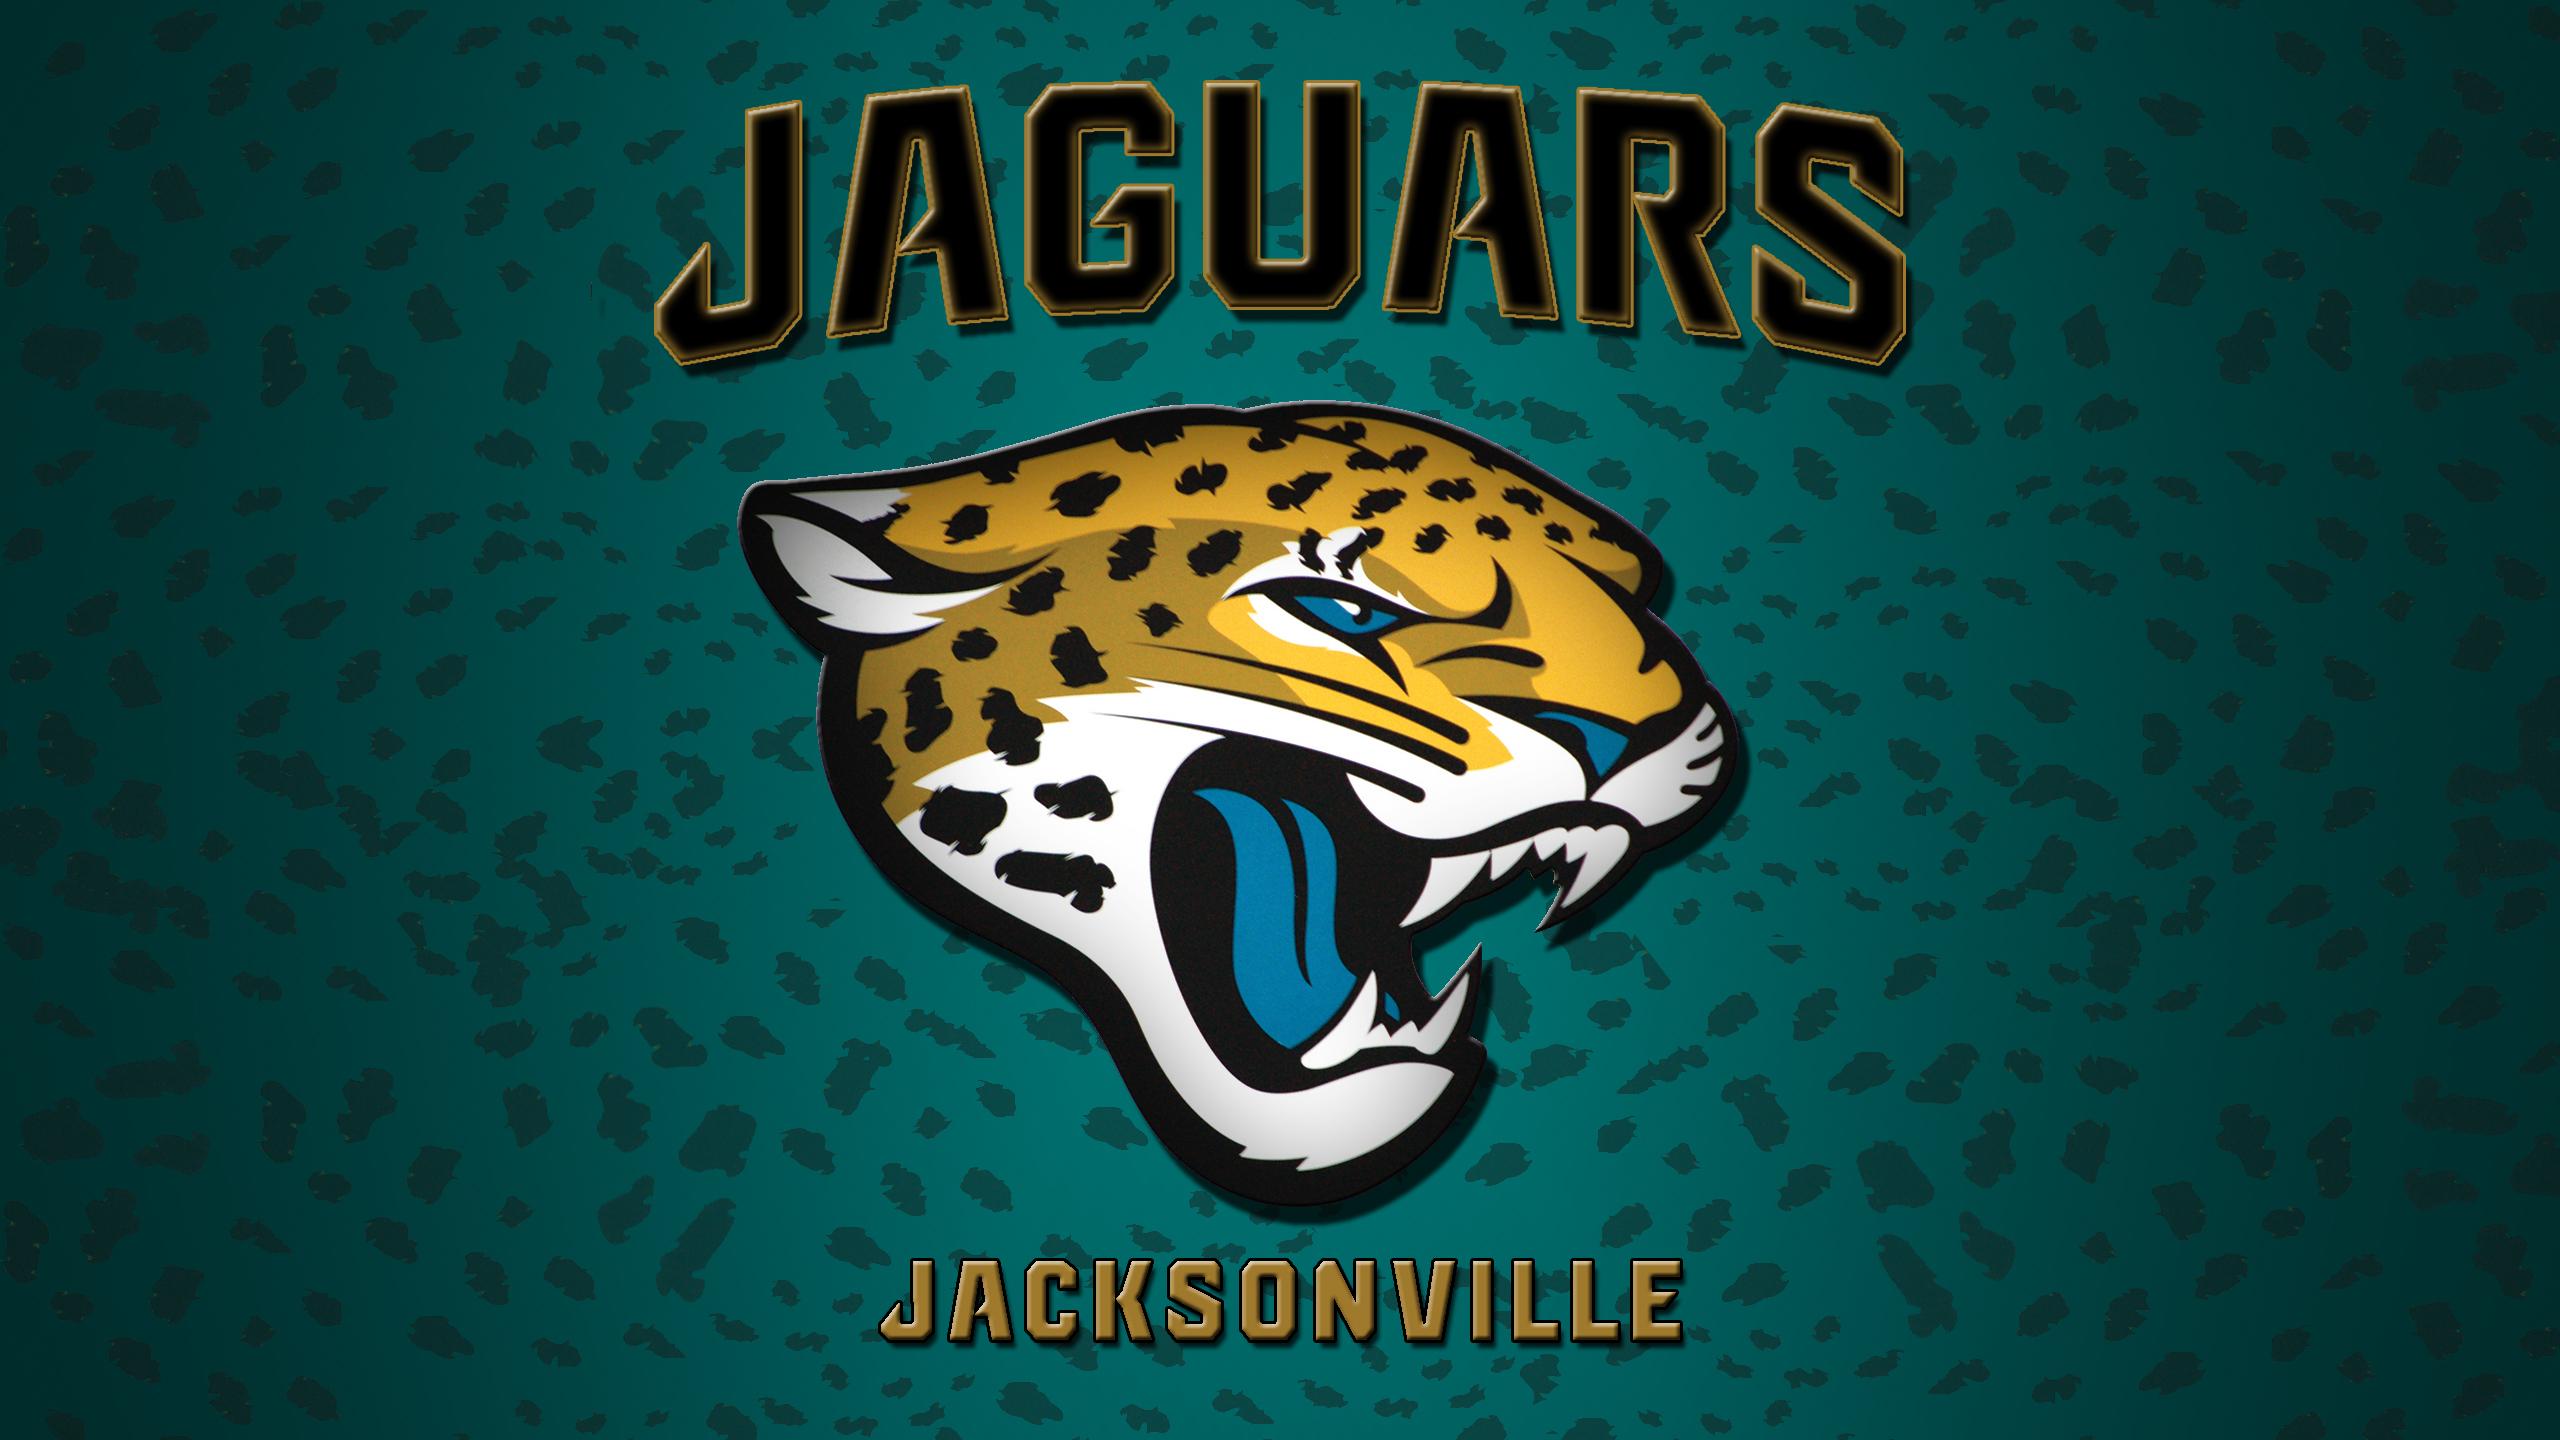 Jacksonville Jaguars by BeAware8 2560x1440